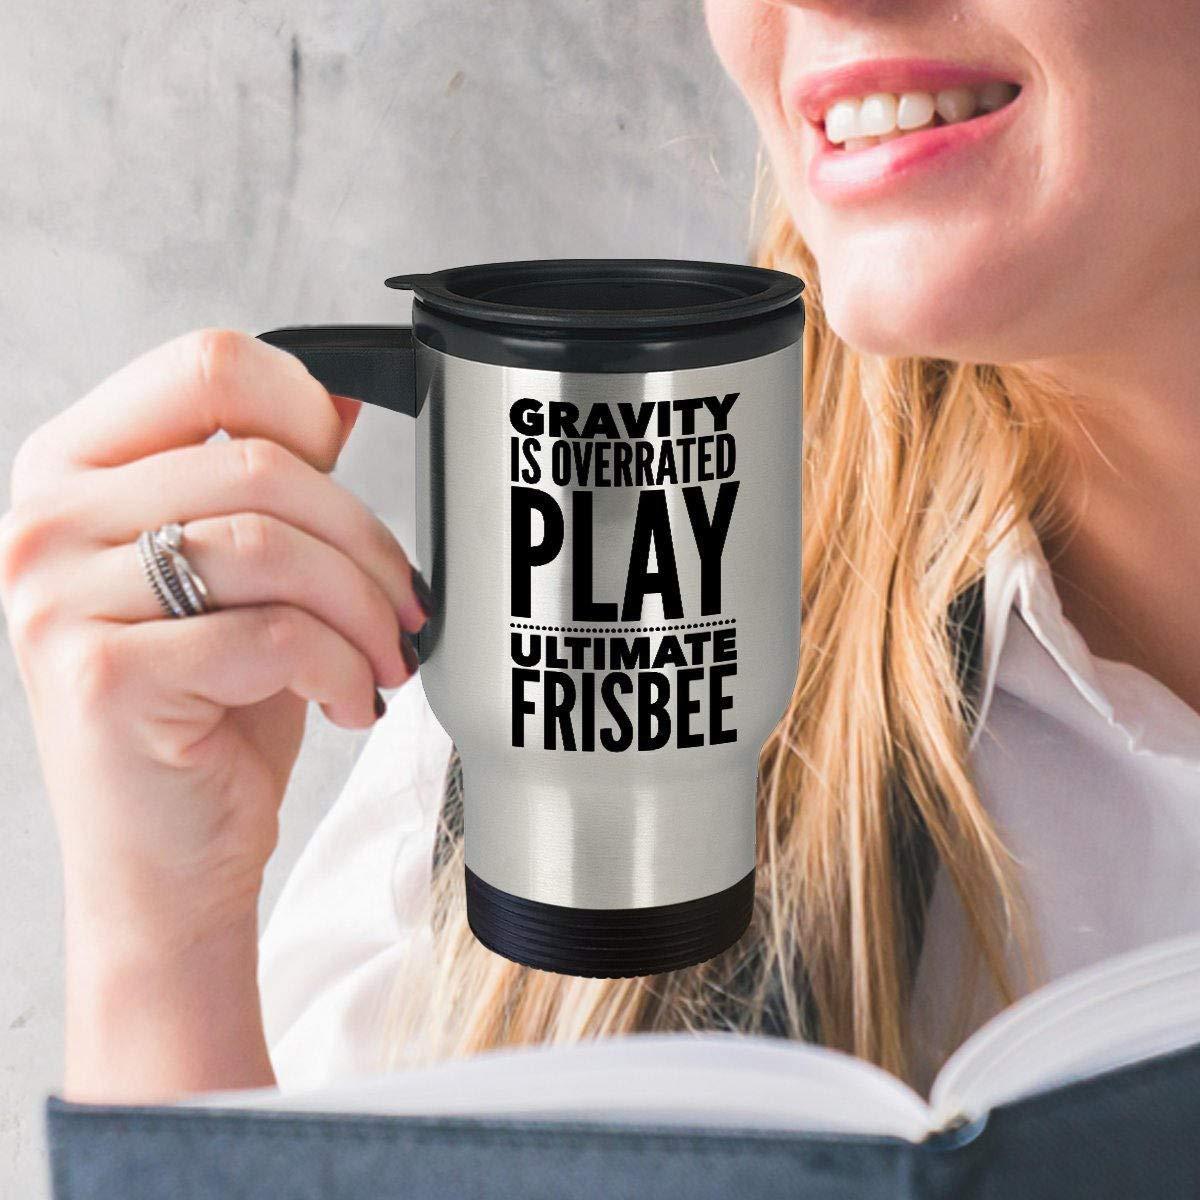 Frisbee Mug de voyage Ultimate Frisbee Tasse Funny Mug de frisbee Frisbee Idée de cadeau Gravity est Overrated Play Ultimate Frisbee 396,9gram